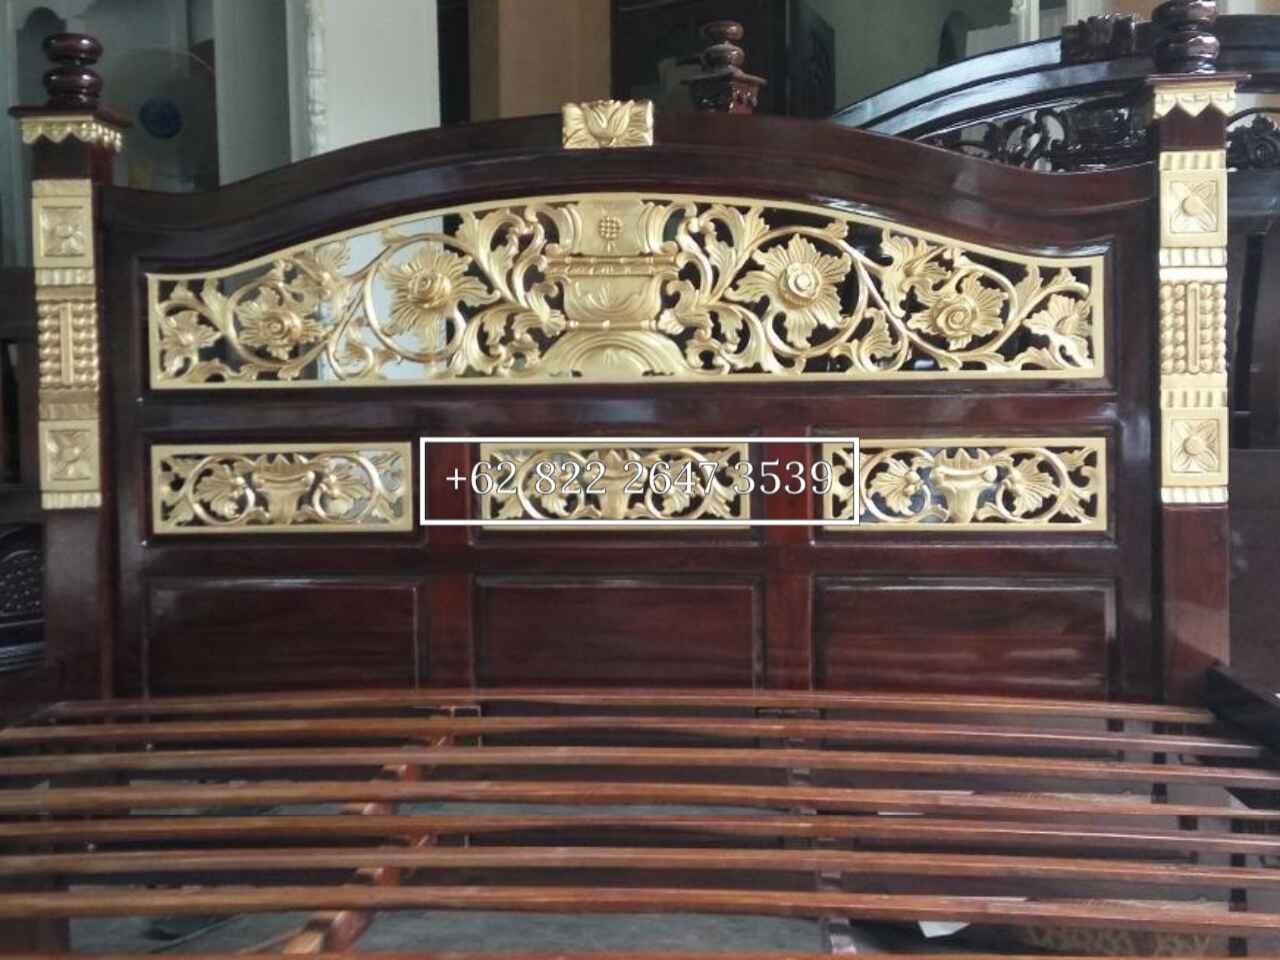 tempat tidur, tempat tidur ukiran rahwana, tempat tidur kayu jati, dipan ukiran, ranjang kayu jati